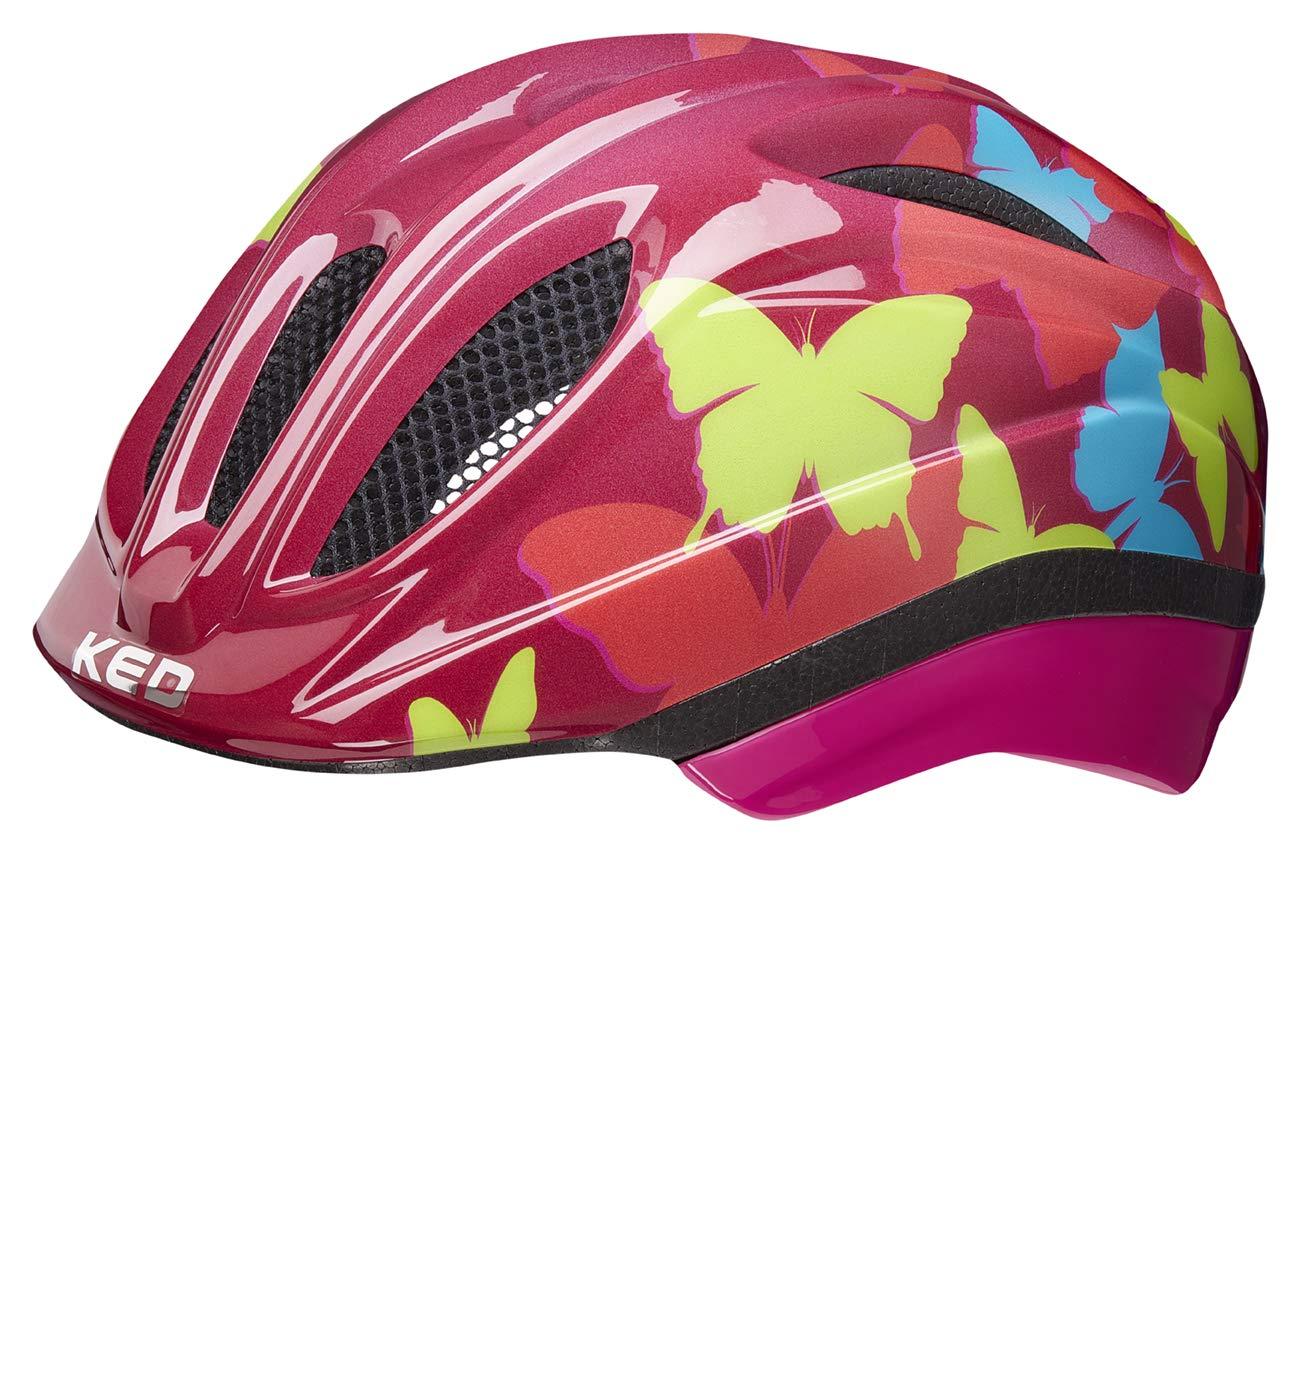 KED Fahrradhelm Kinder und Jugend Meggy Trend Butterfly Bordeaux 52-58 cm M